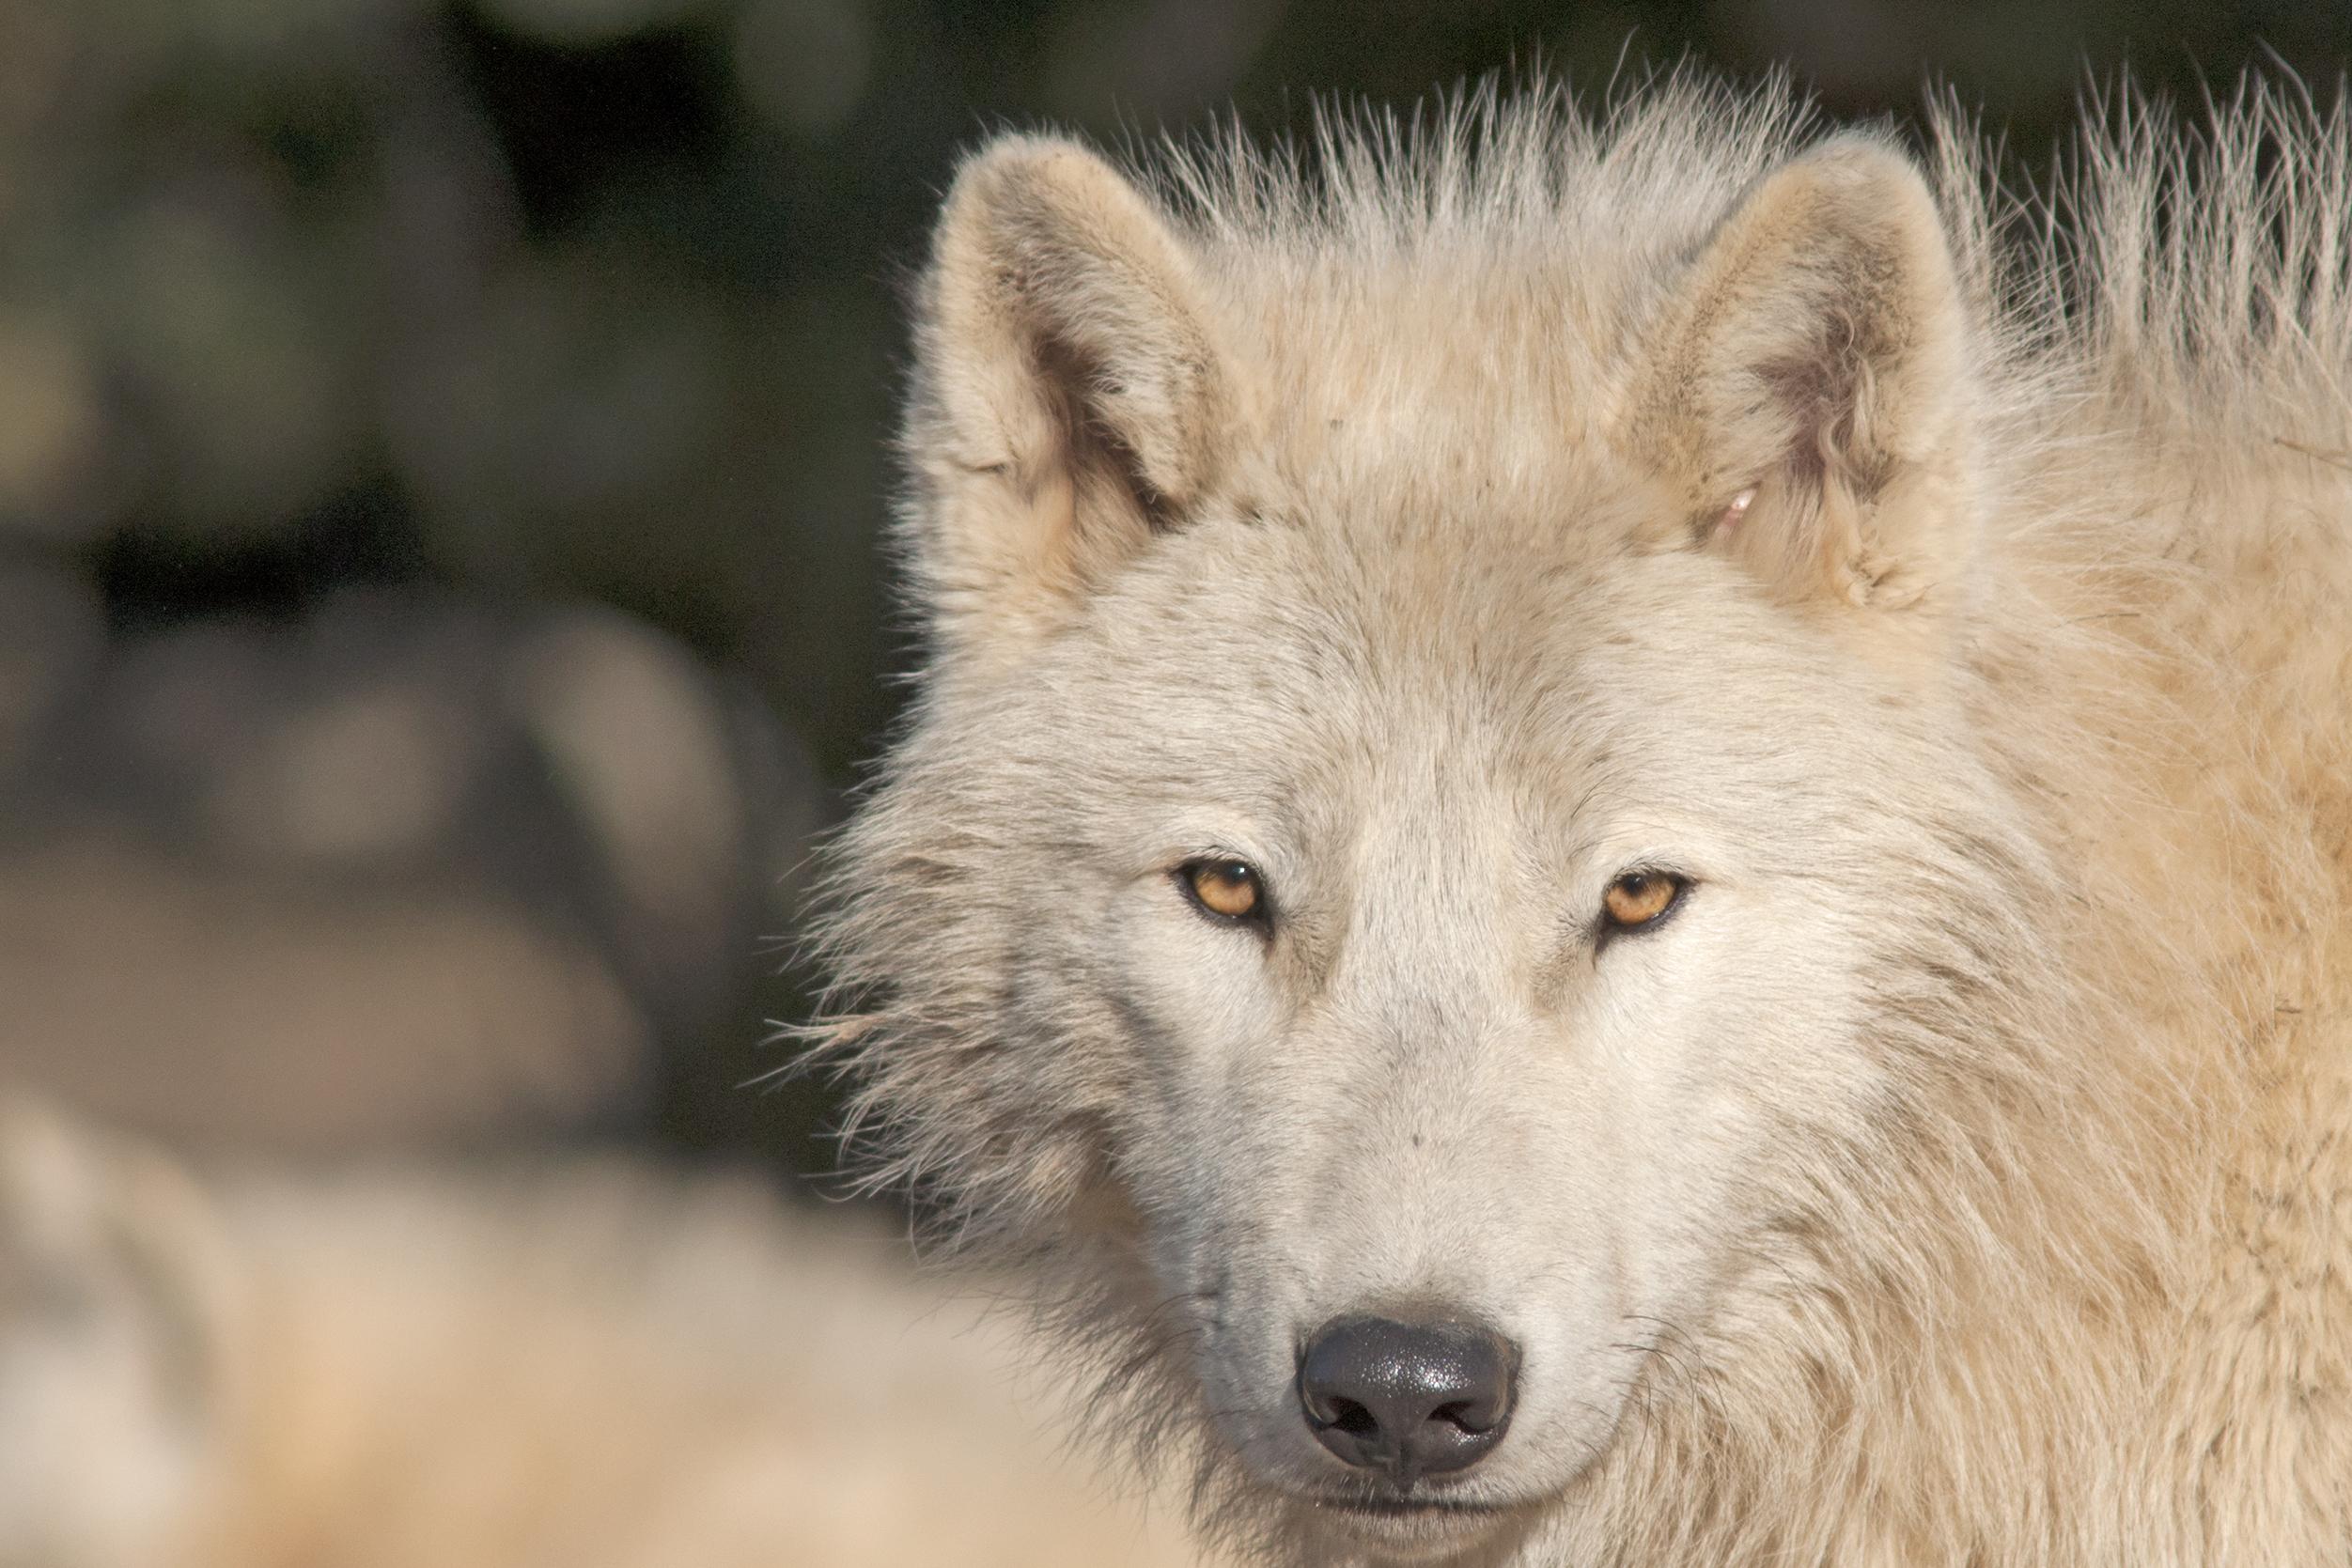 An Arctic wolf close up